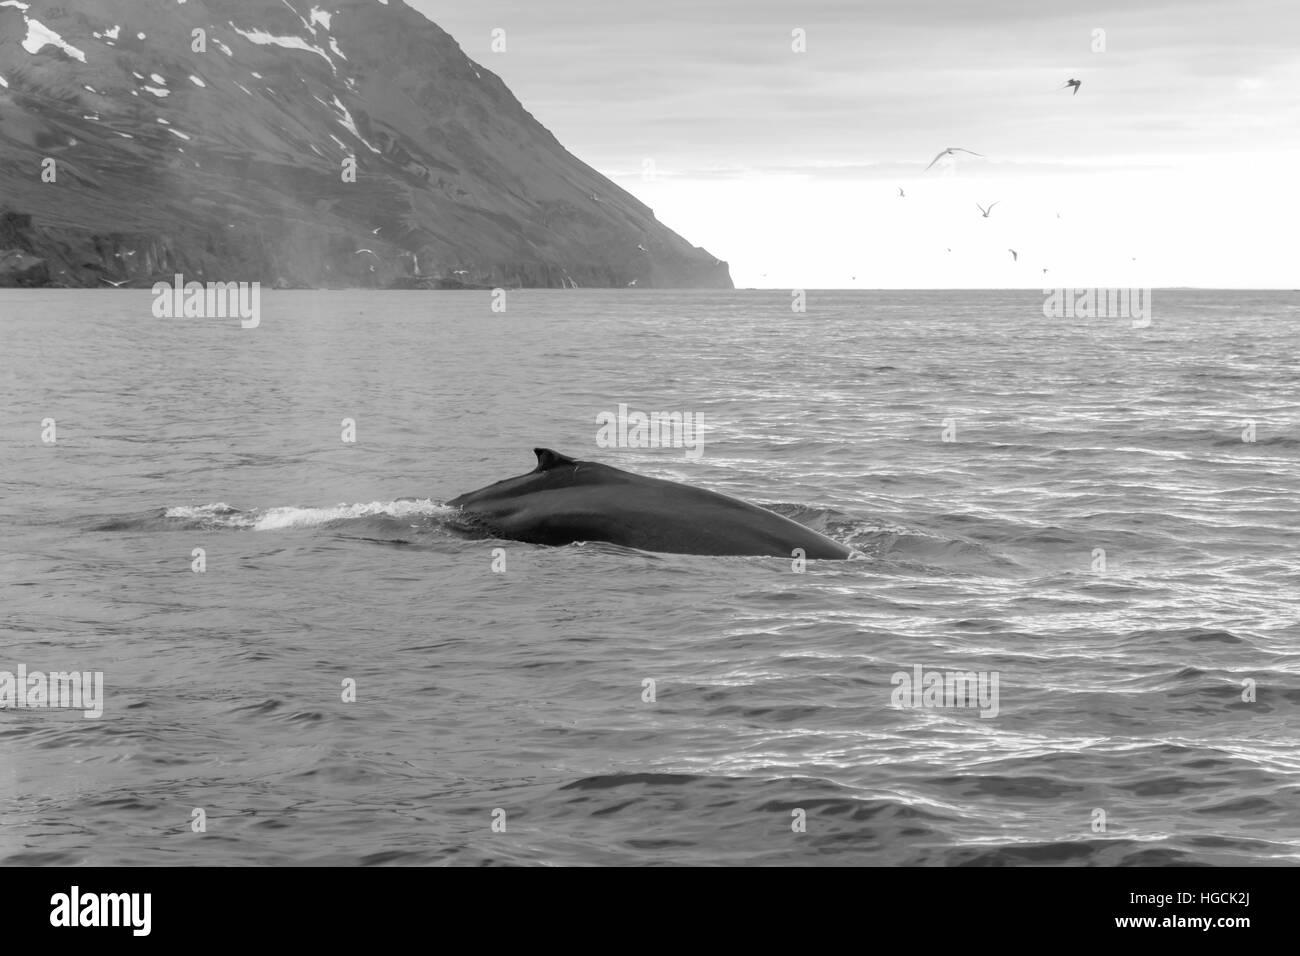 Una copia de una ballena, cerca de Husavik, al nordeste de Islandia Foto de stock